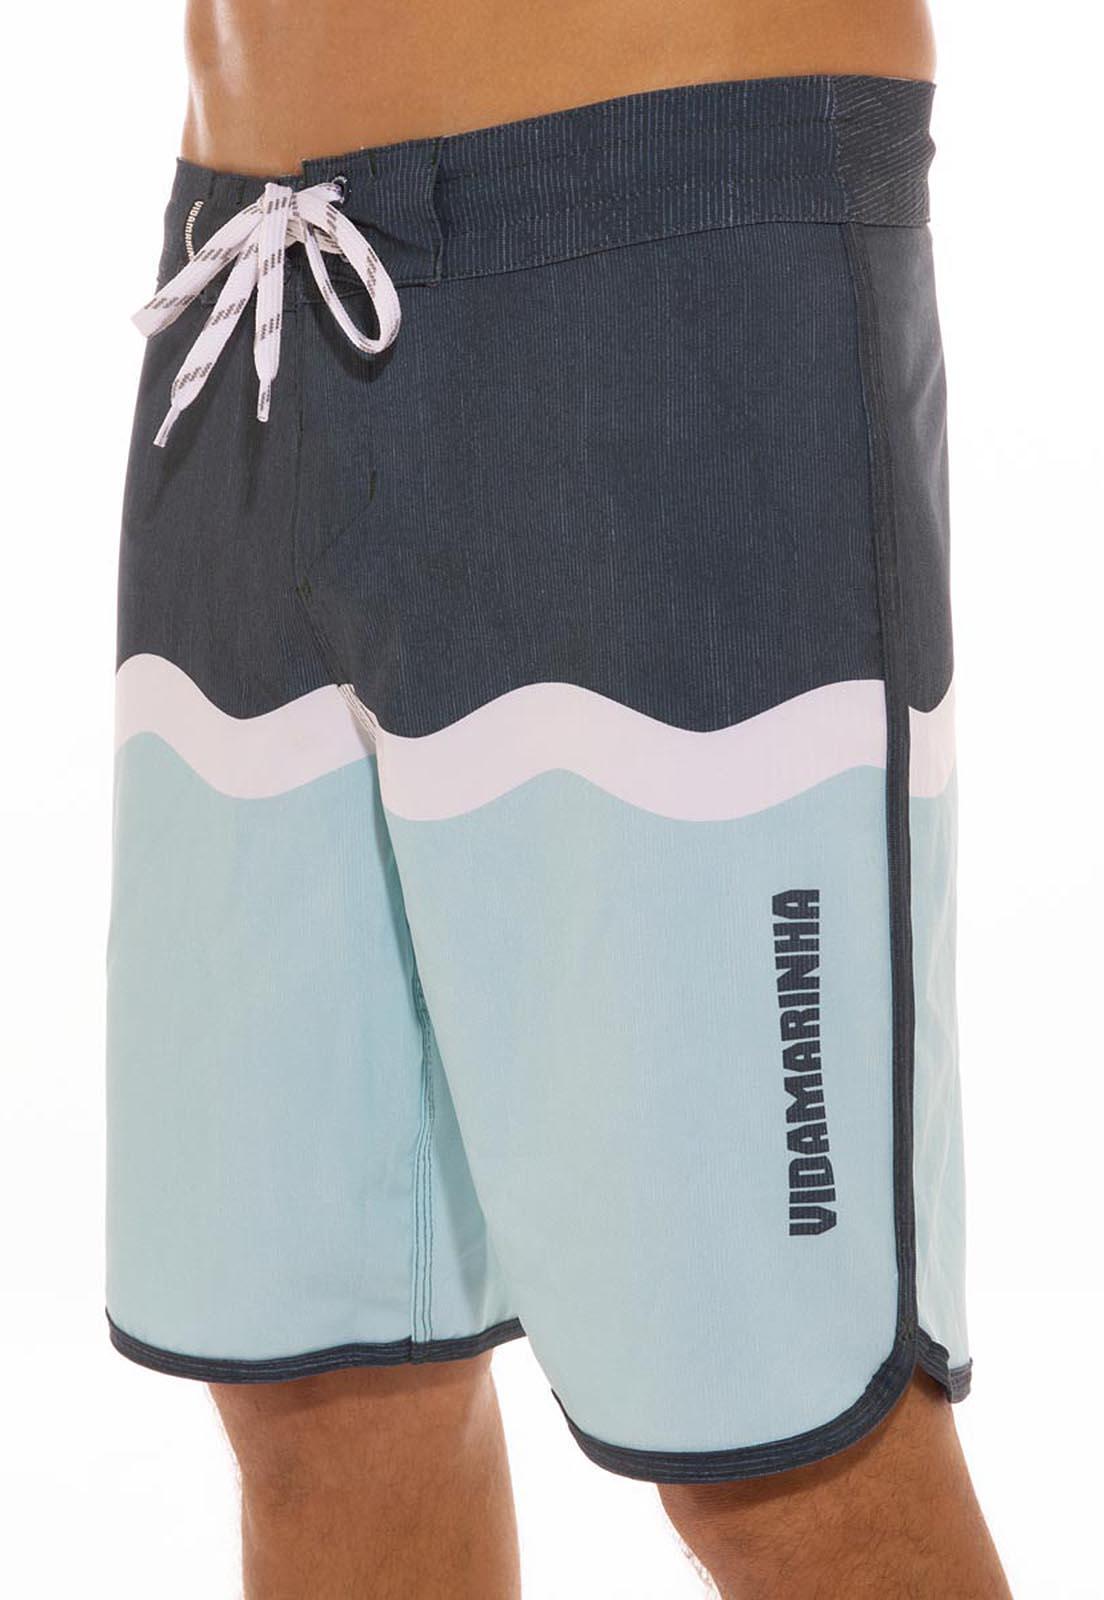 Bermuda Vida Marinha Surf Azul-Marinho/Branco/Azul